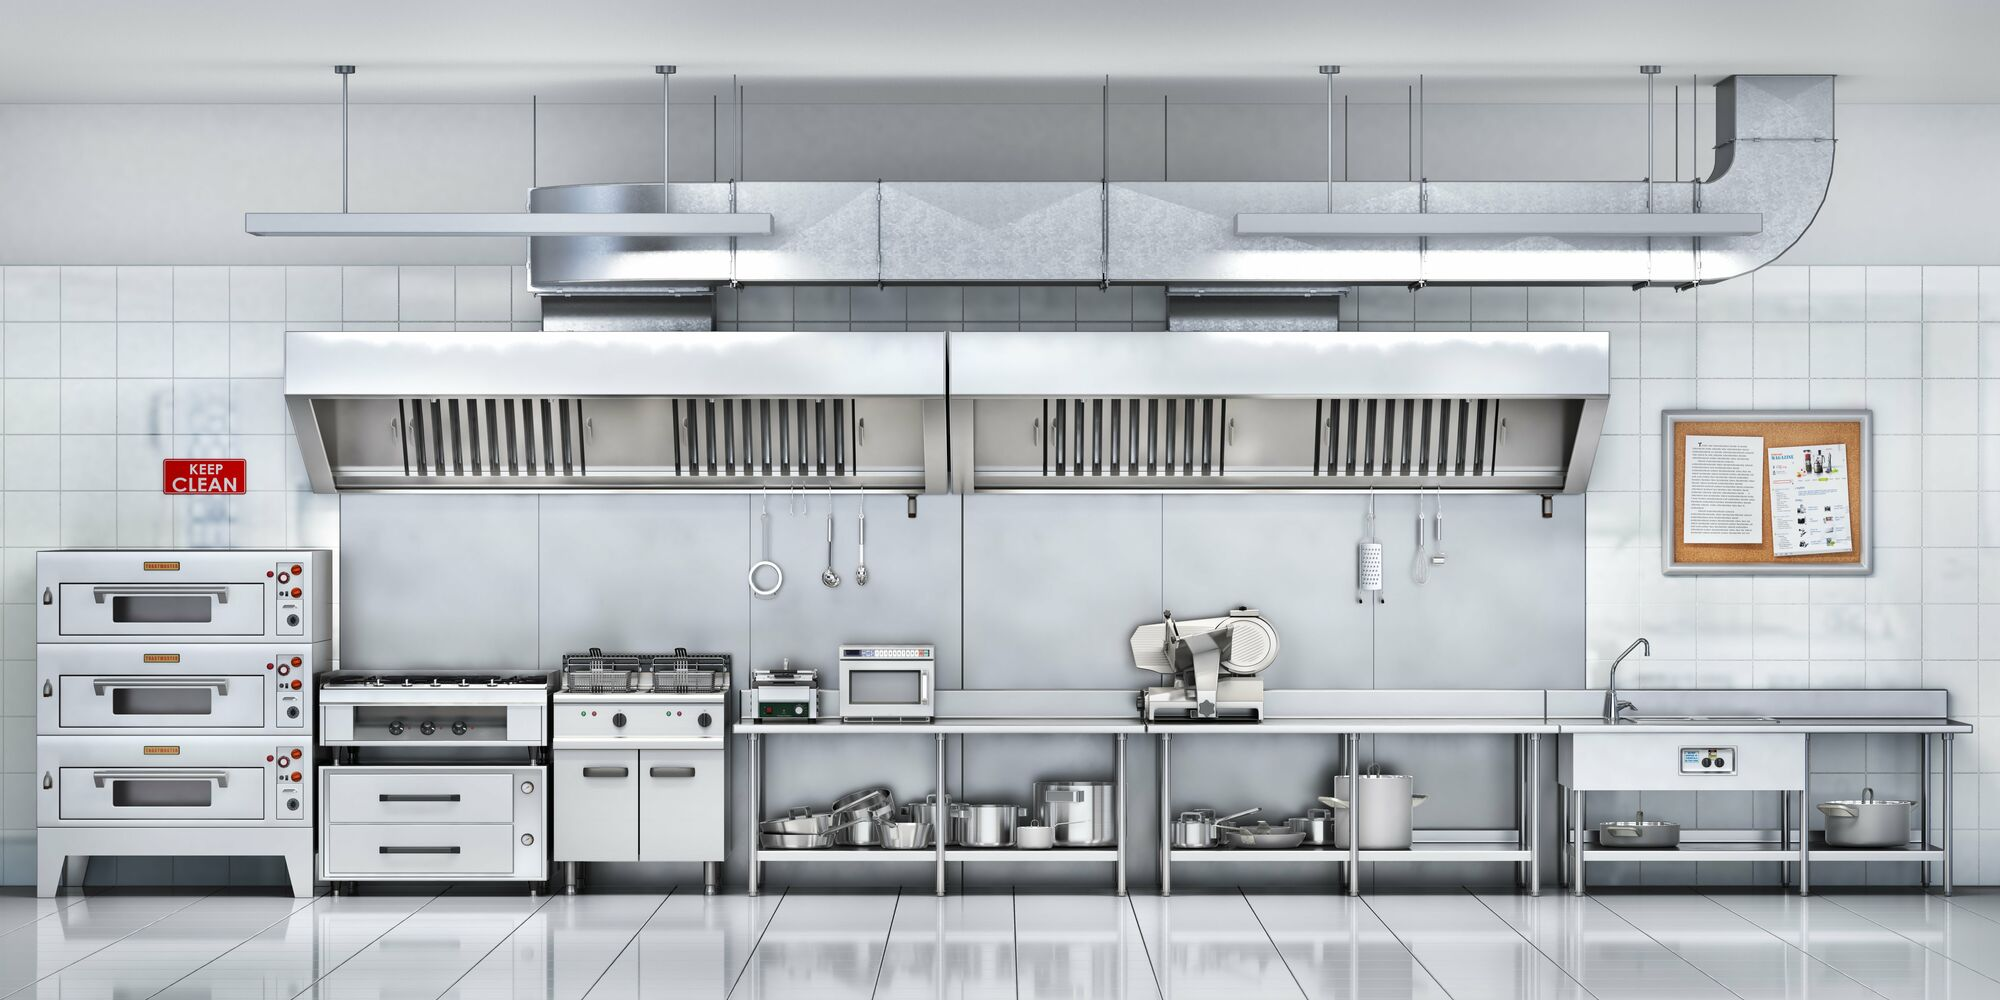 Basislijst keuken